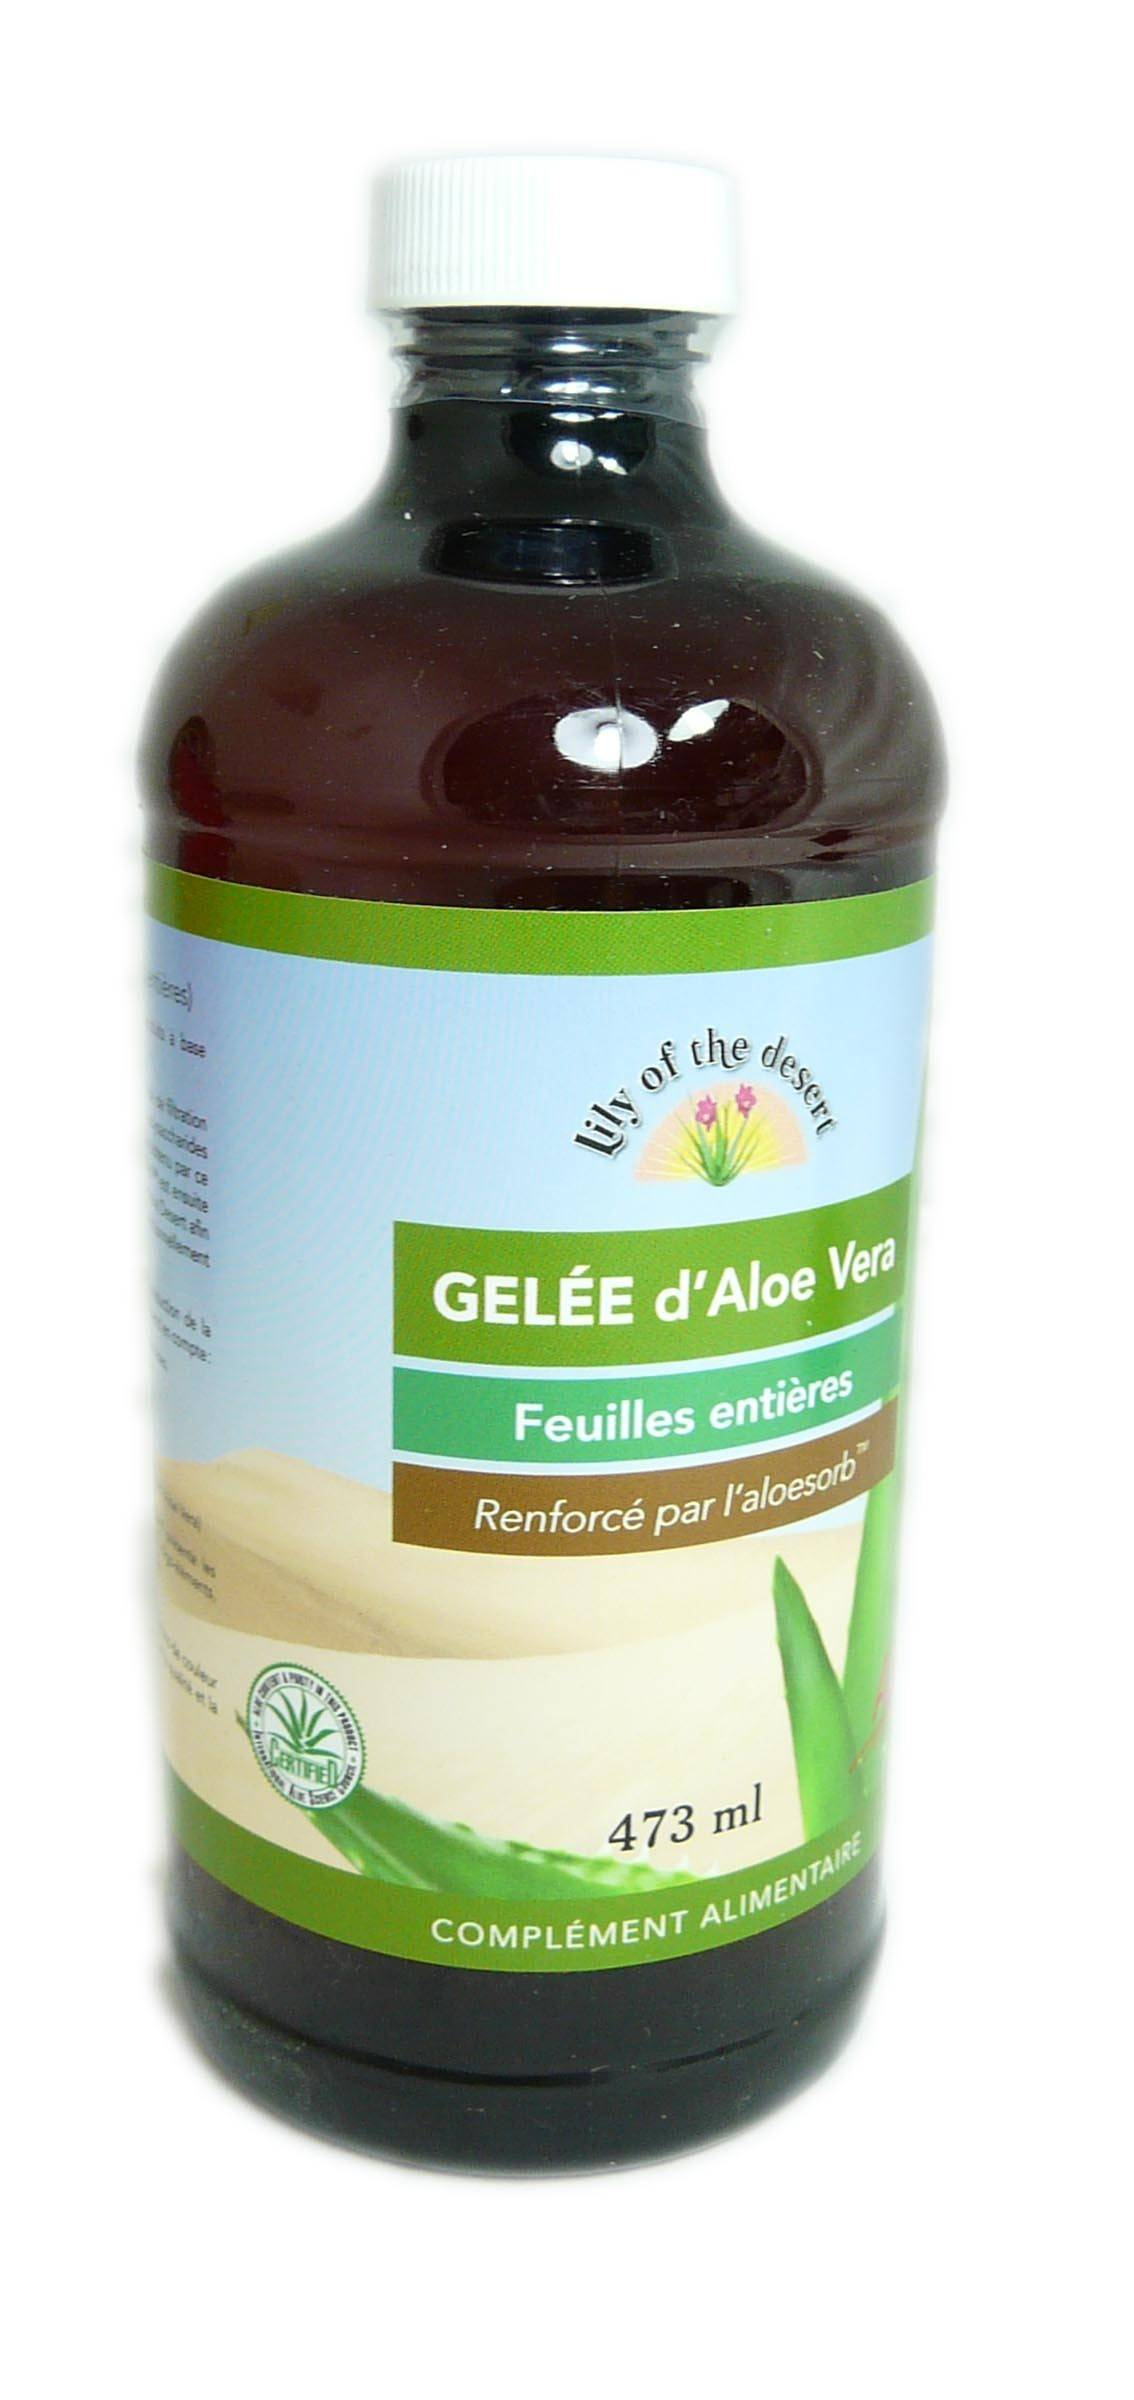 LILY OF THE DESERT Gelee d'aloe lily of the desert 473ml